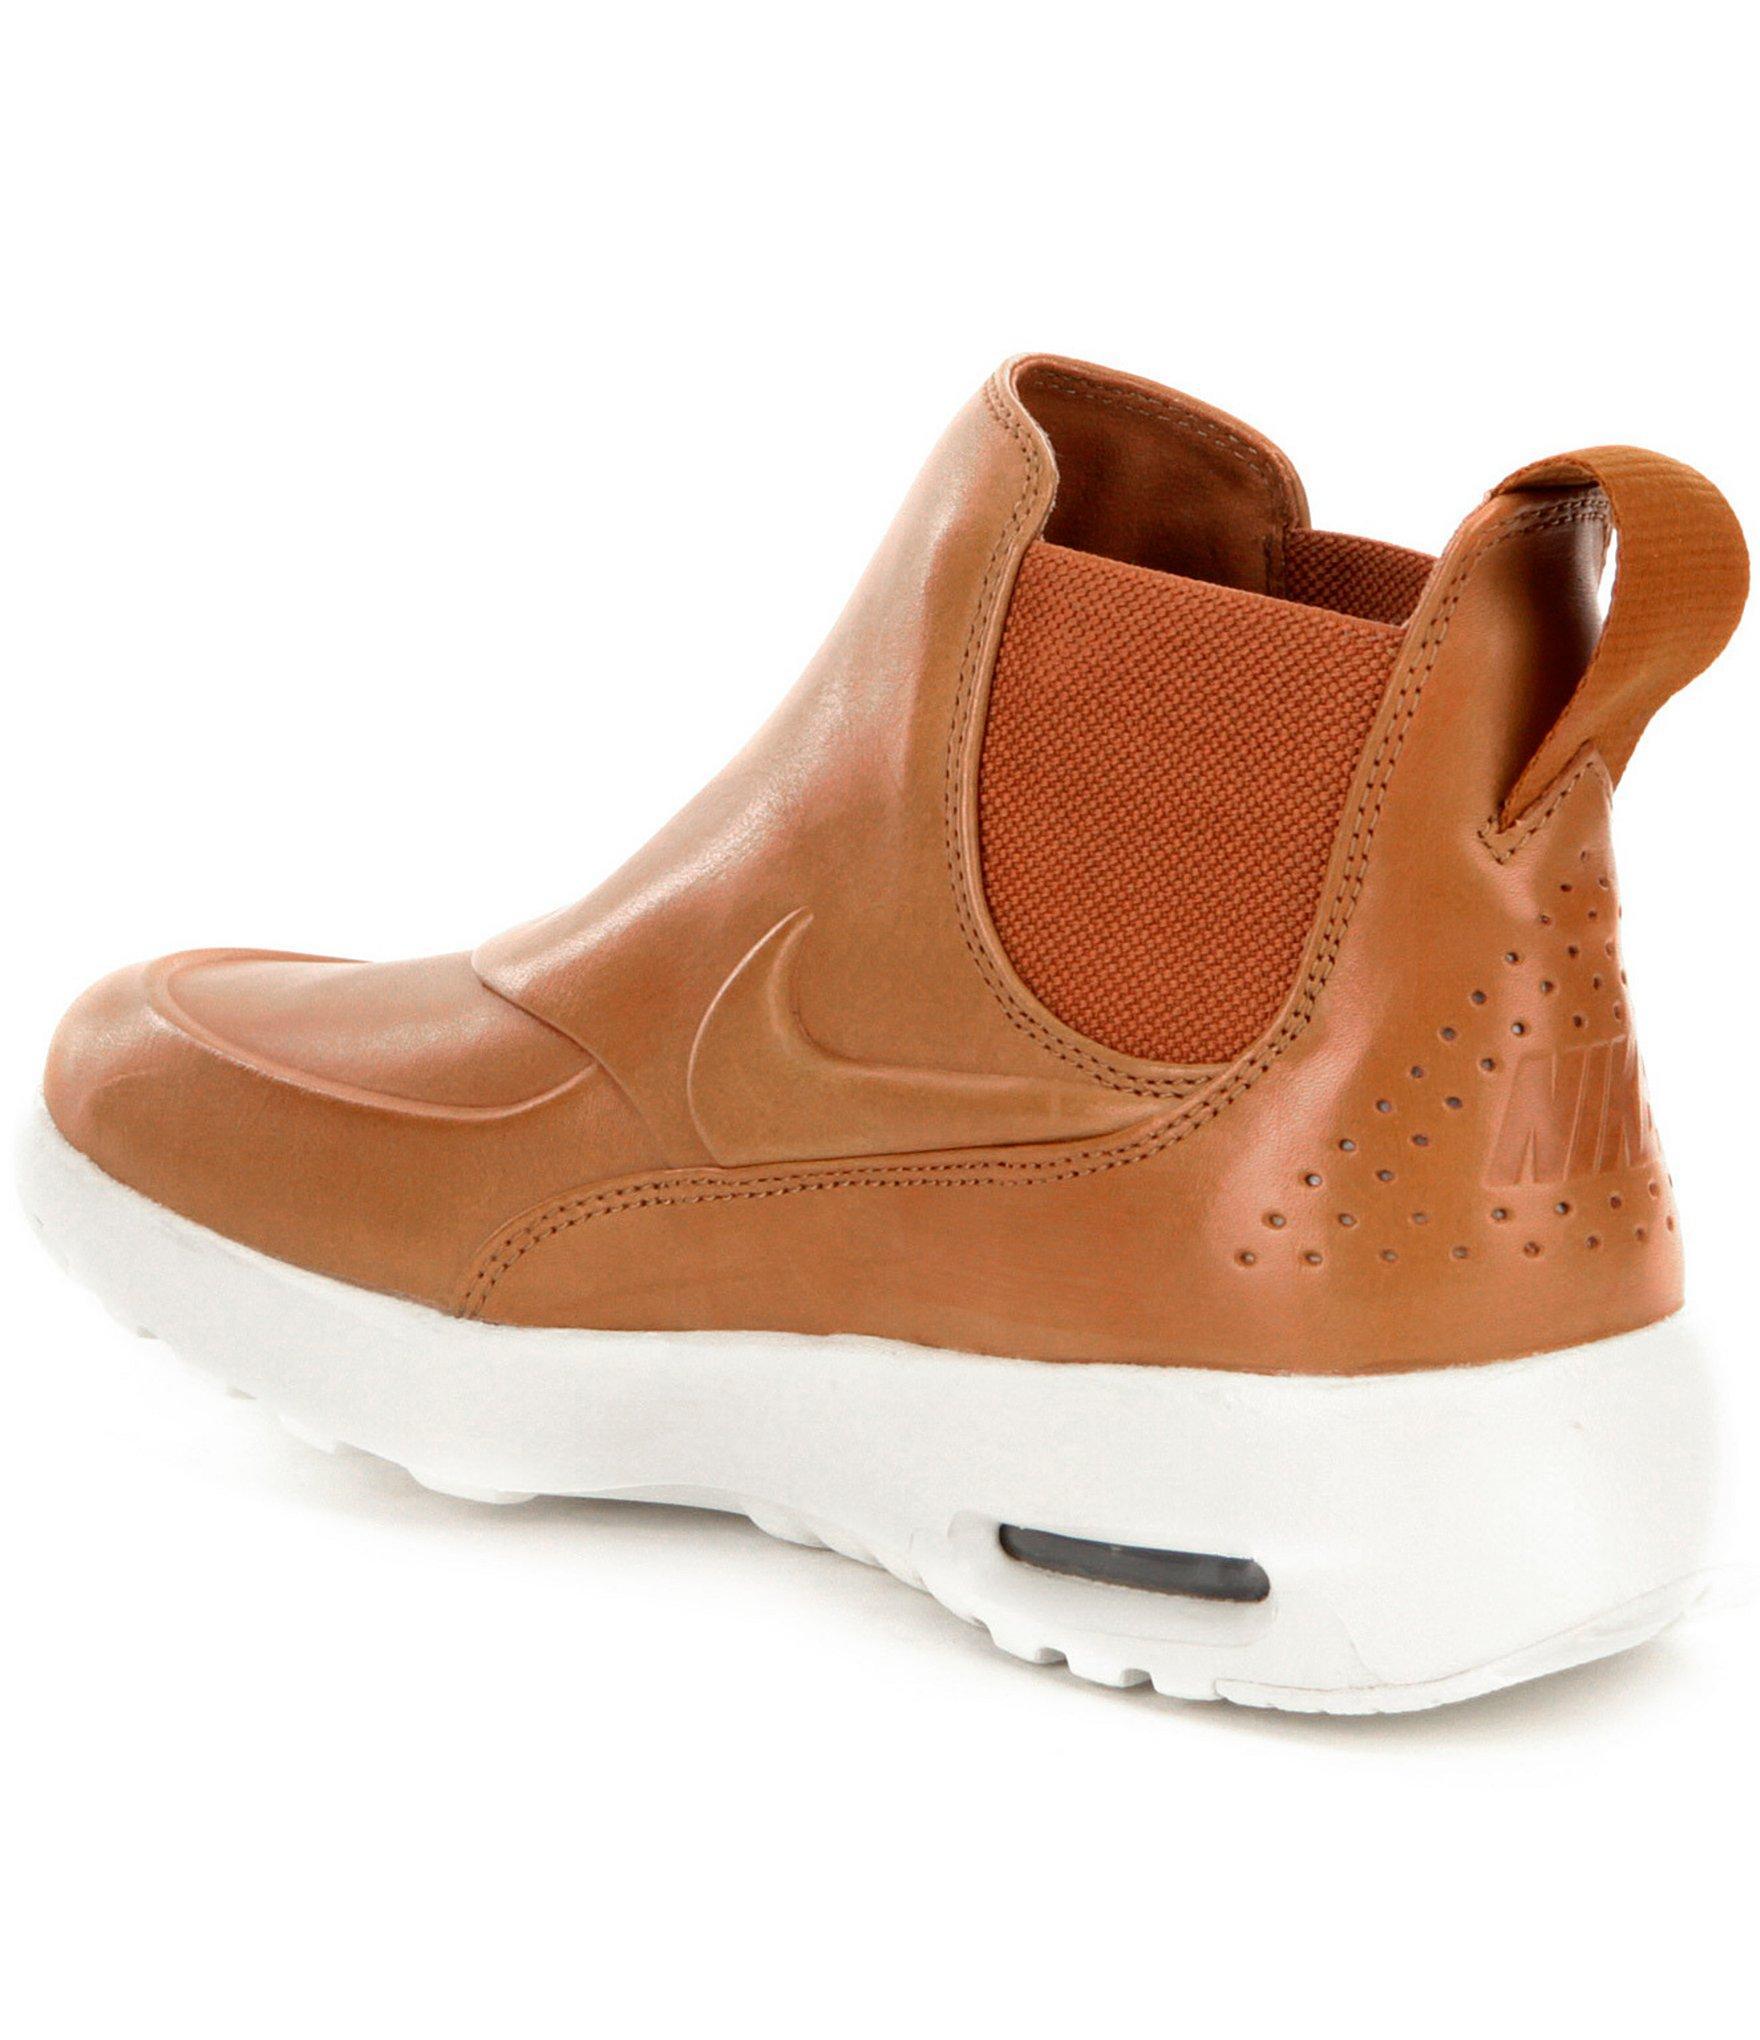 fe6e7862e3994b Lyst - Nike Women ́s Air Max Thea Mid-top Shoes in Brown